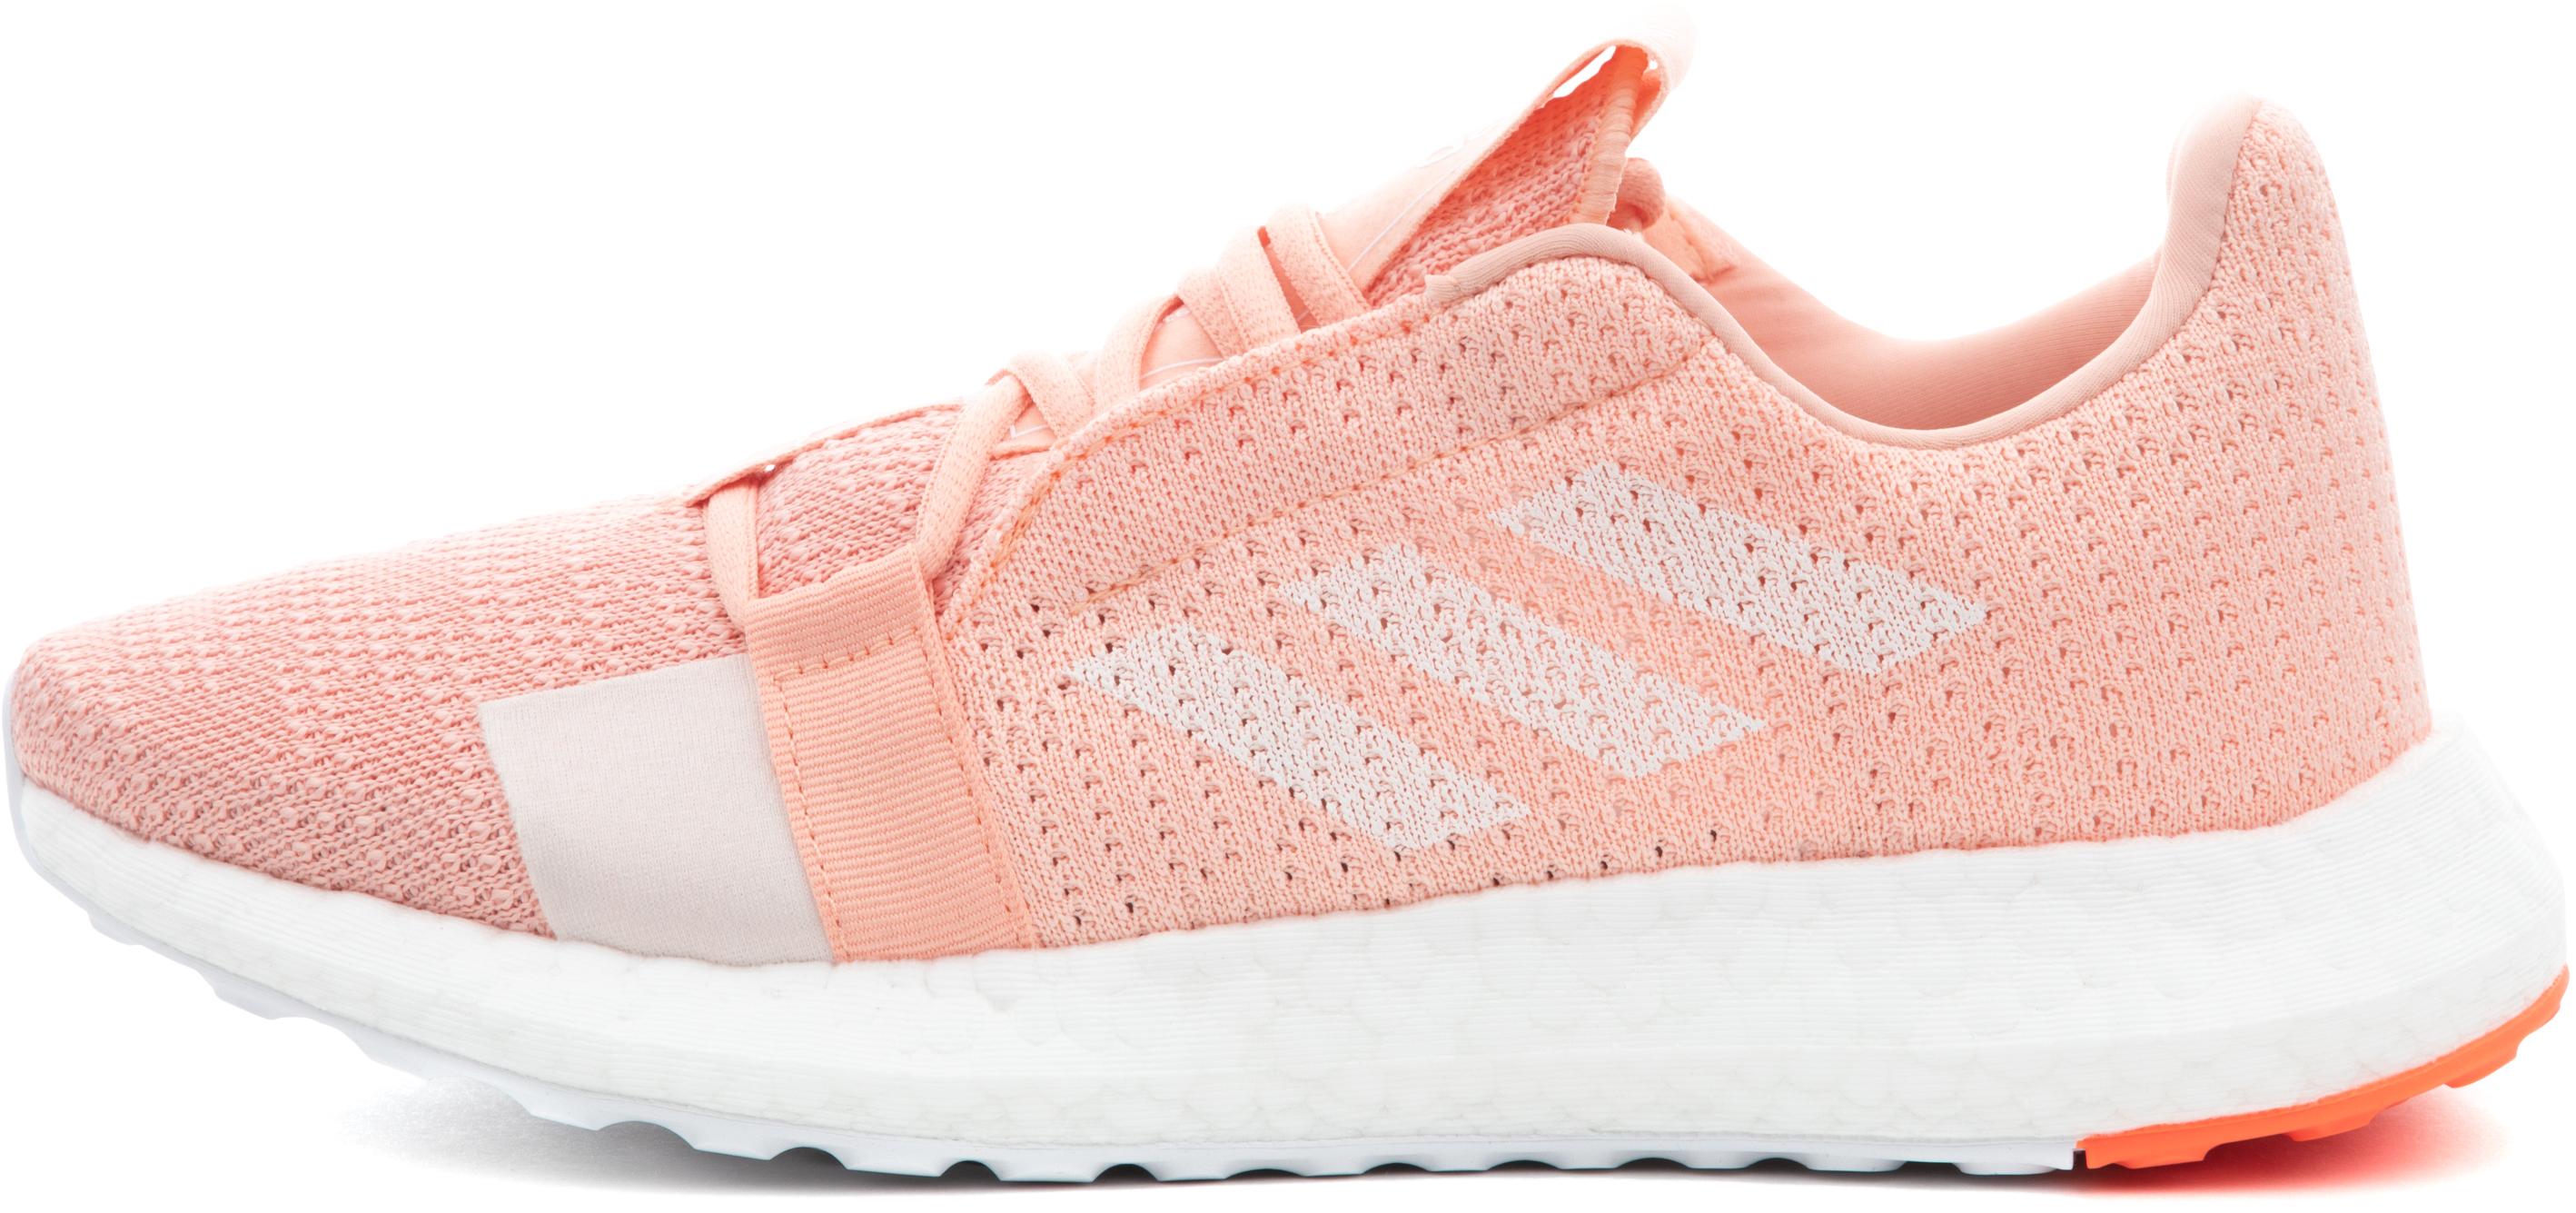 Adidas Кроссовки женские Adidas Senseboost Go, размер 38,5 кроссовки adidas zx flux ild47